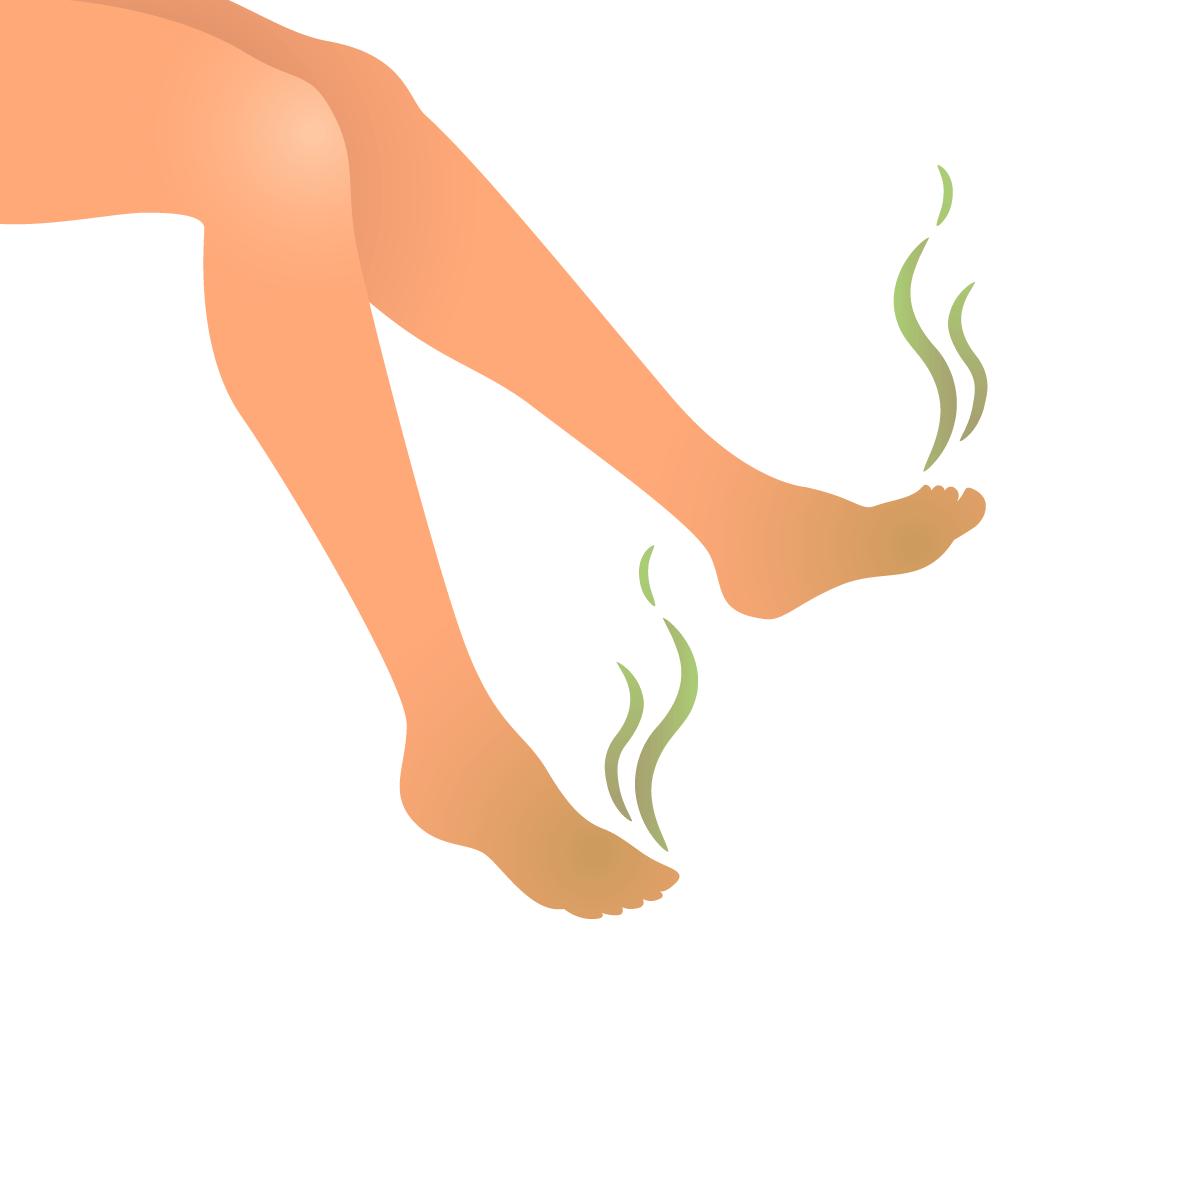 Odor clip art transprent. Feet clipart kind foot